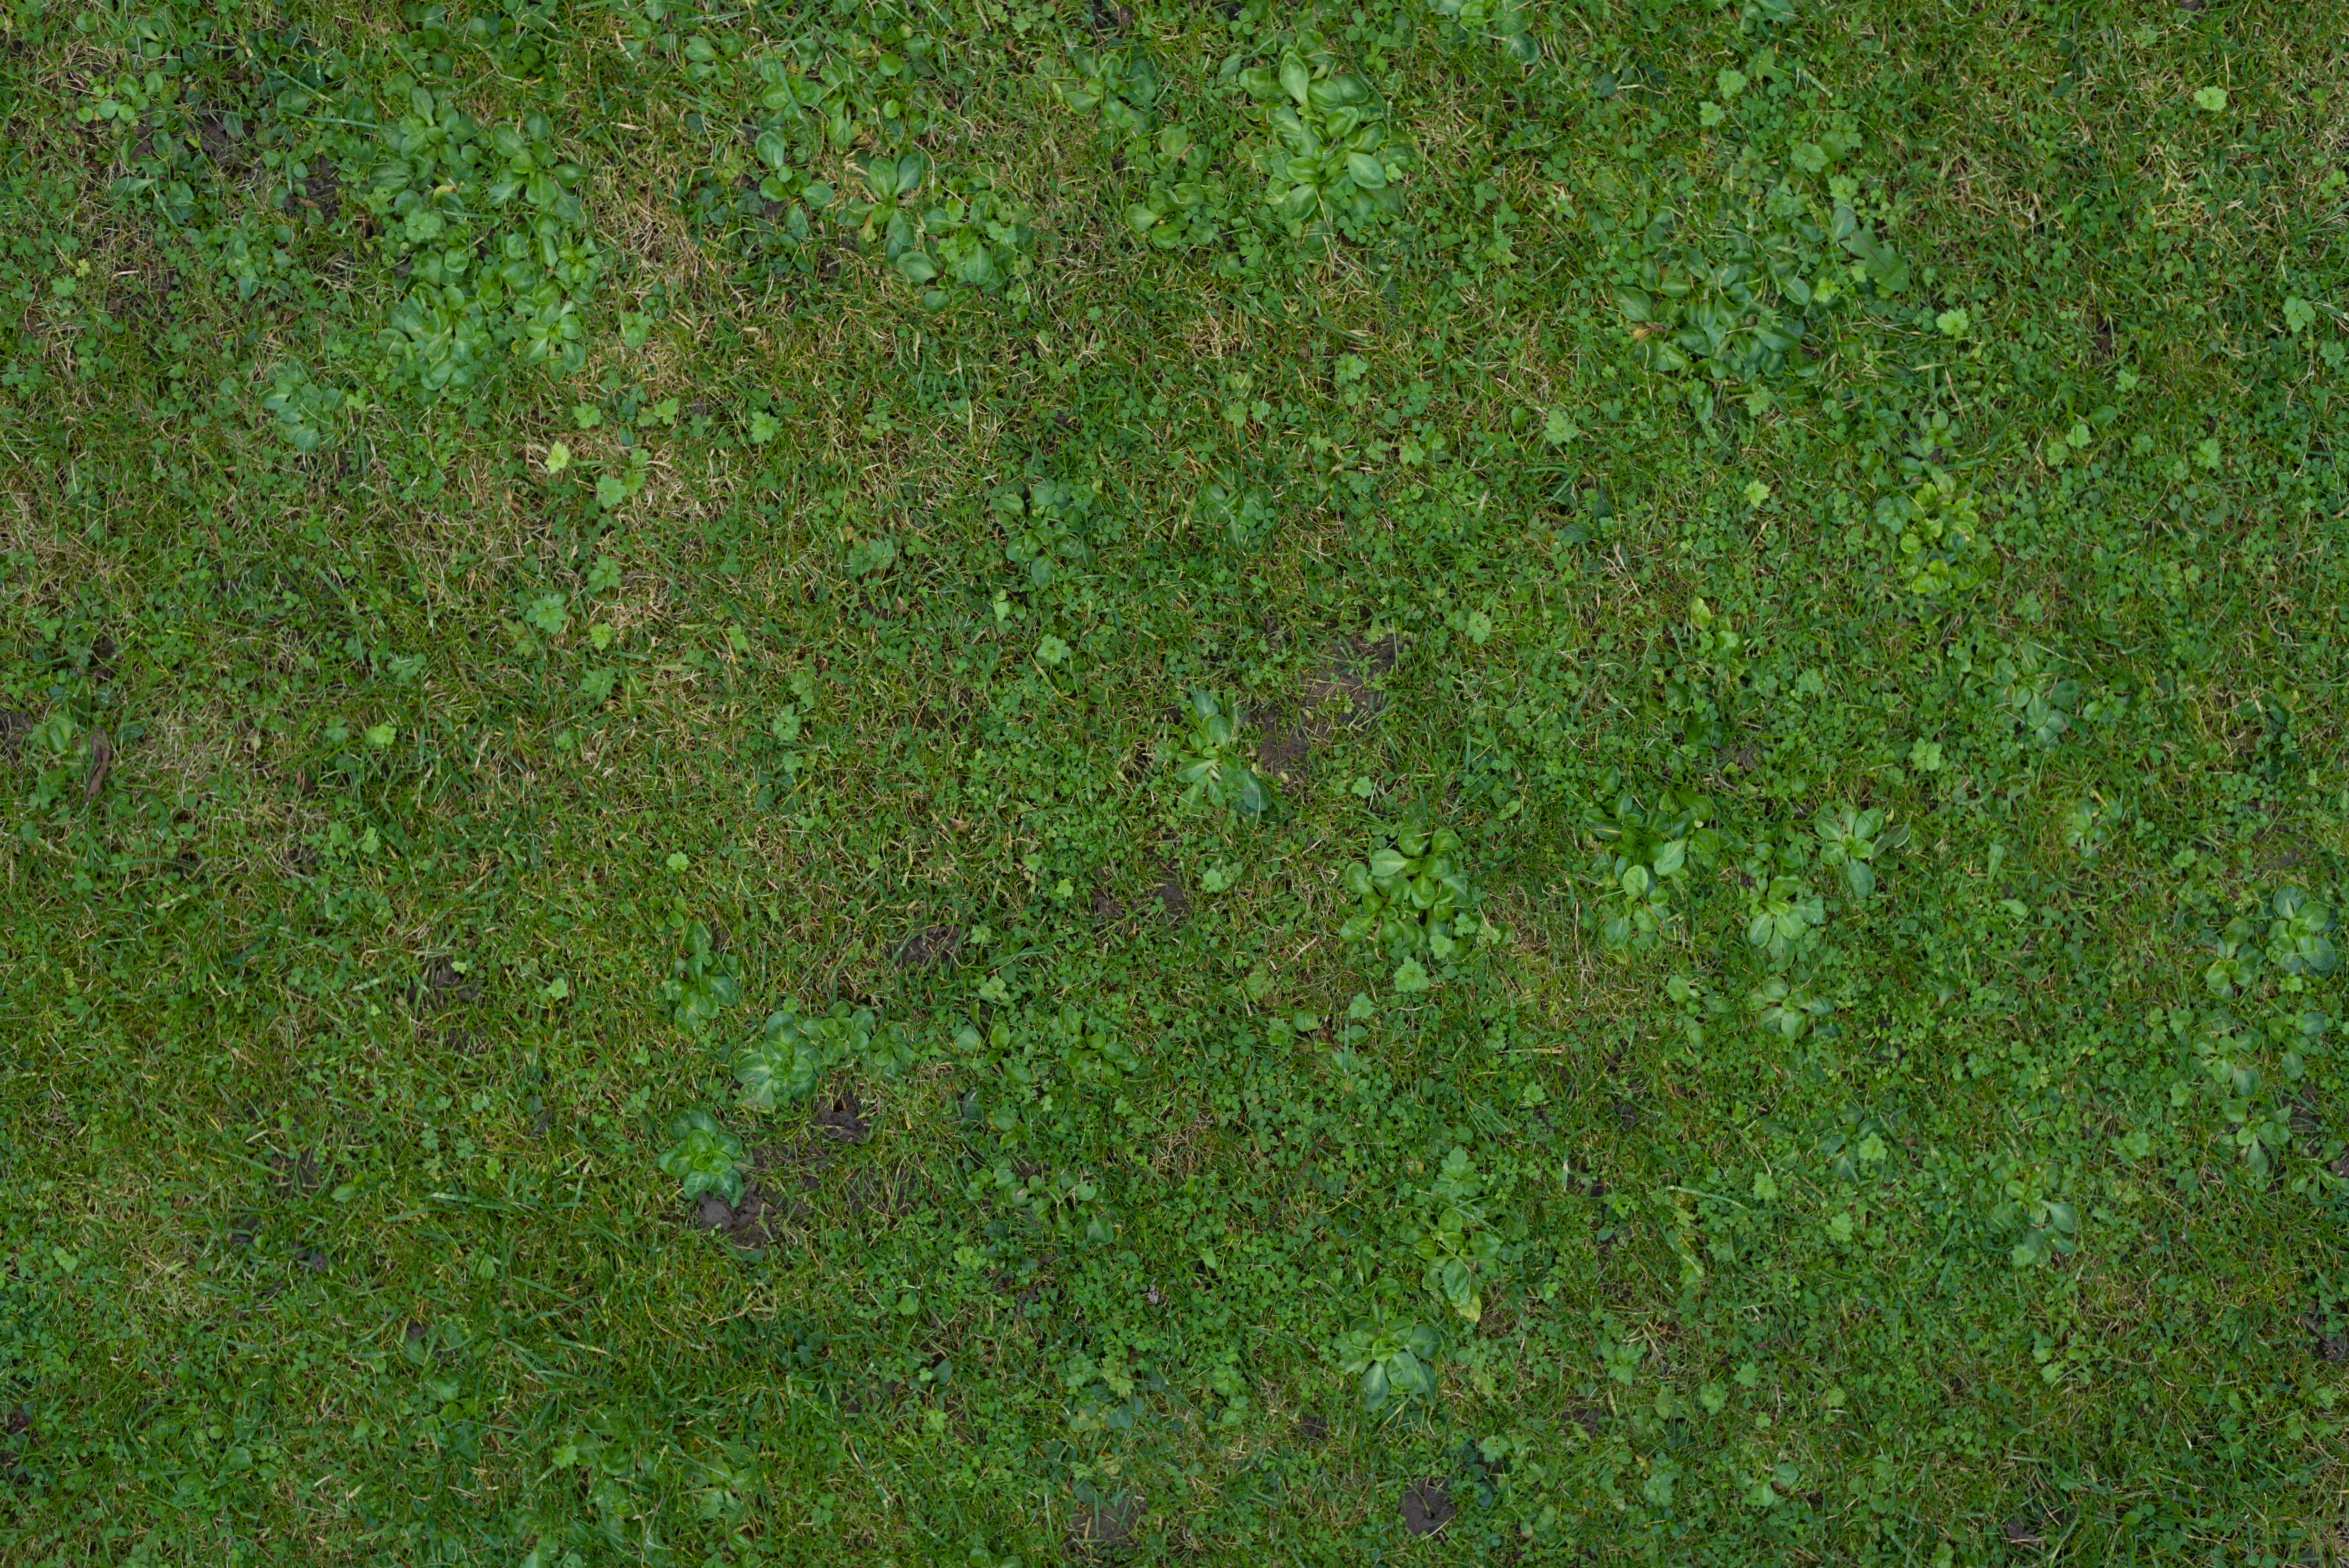 Grass - Texture Ninja